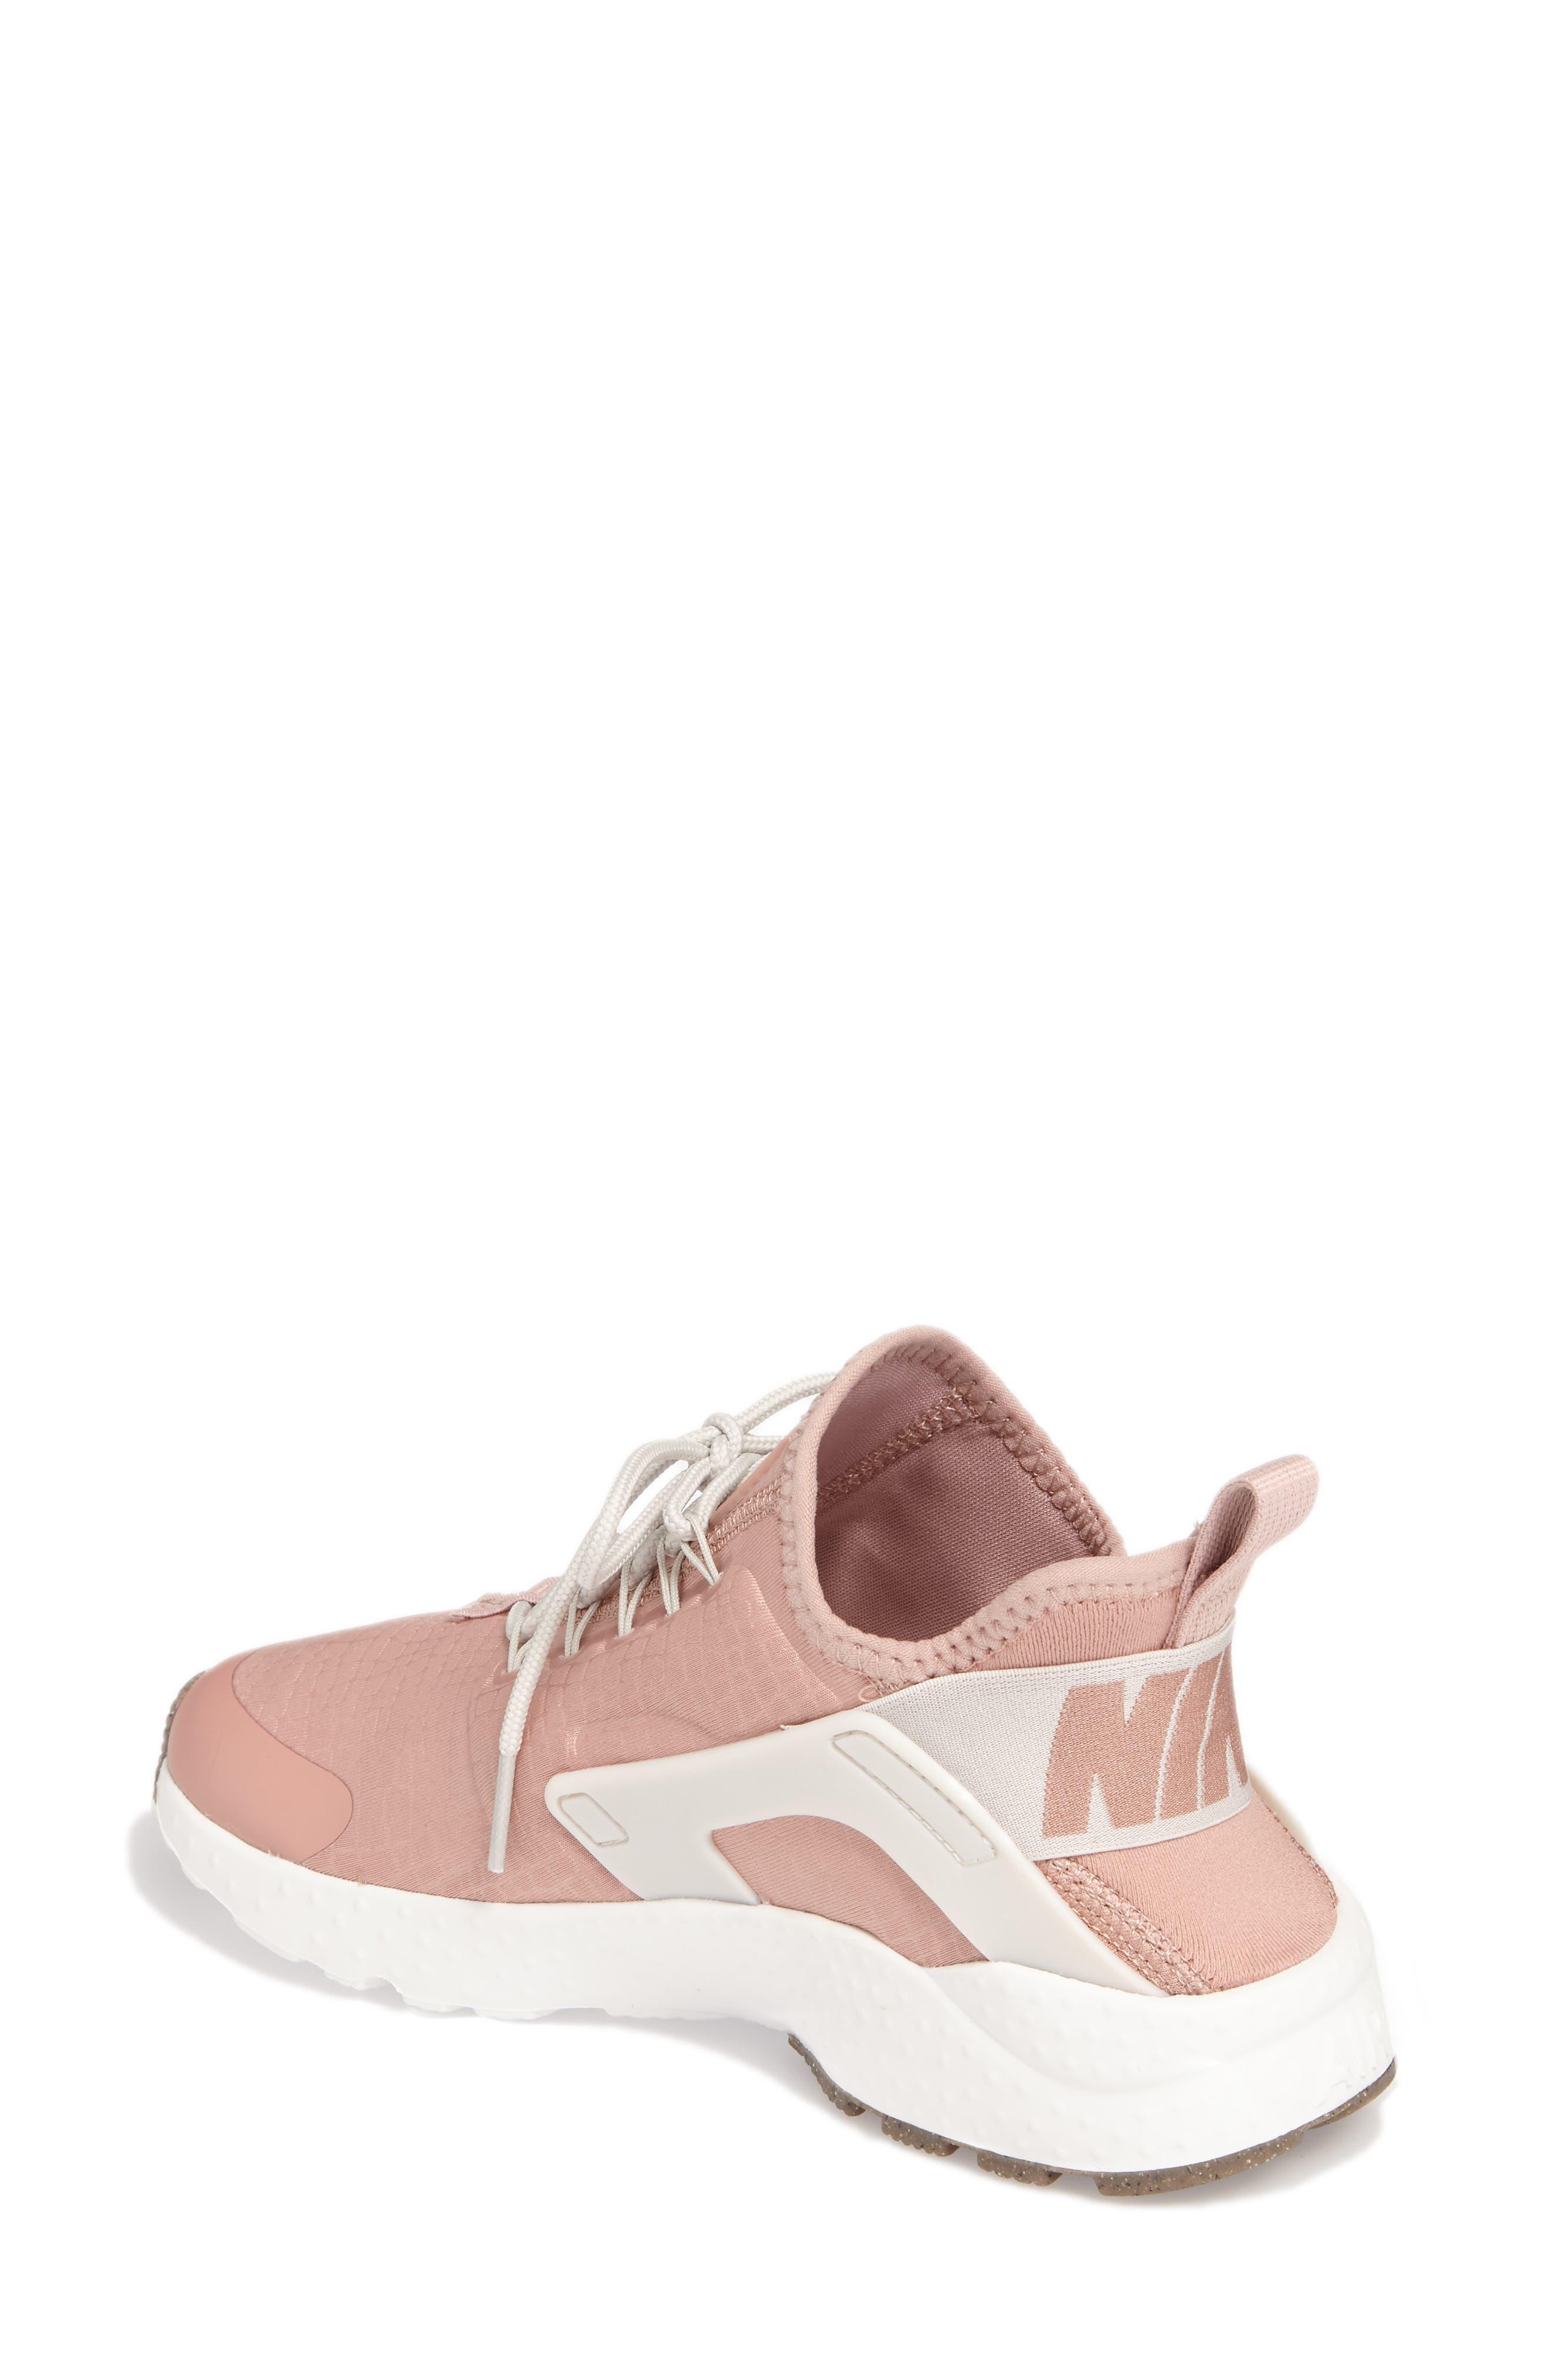 Air Huarache Sneaker,                             Alternate thumbnail 76, color,